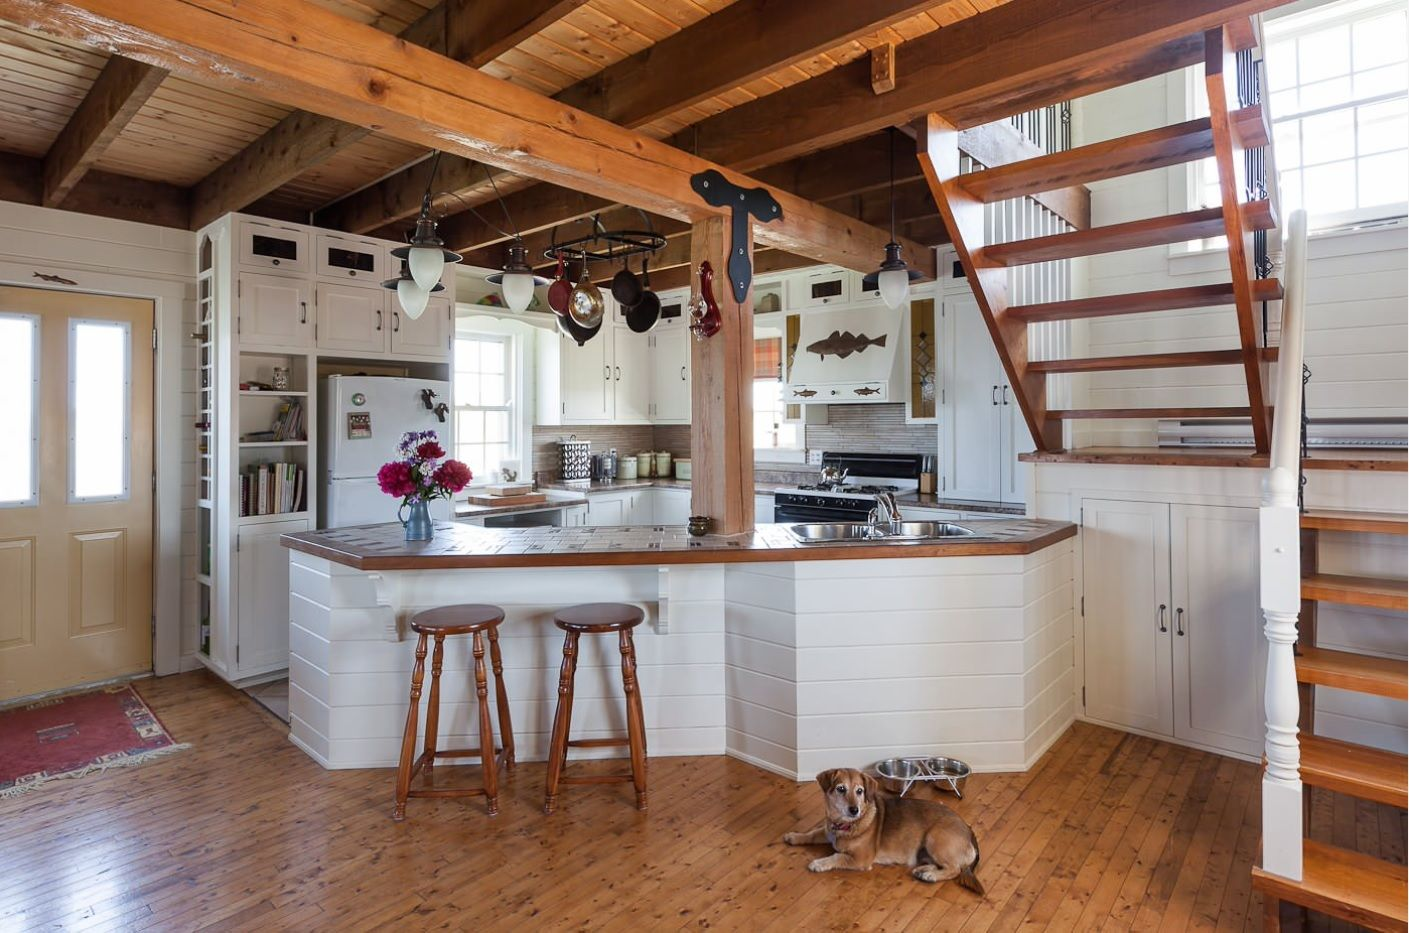 Open Kitchen Design & Interior Decoration. Roomy space under the stairs for improvised kitchen